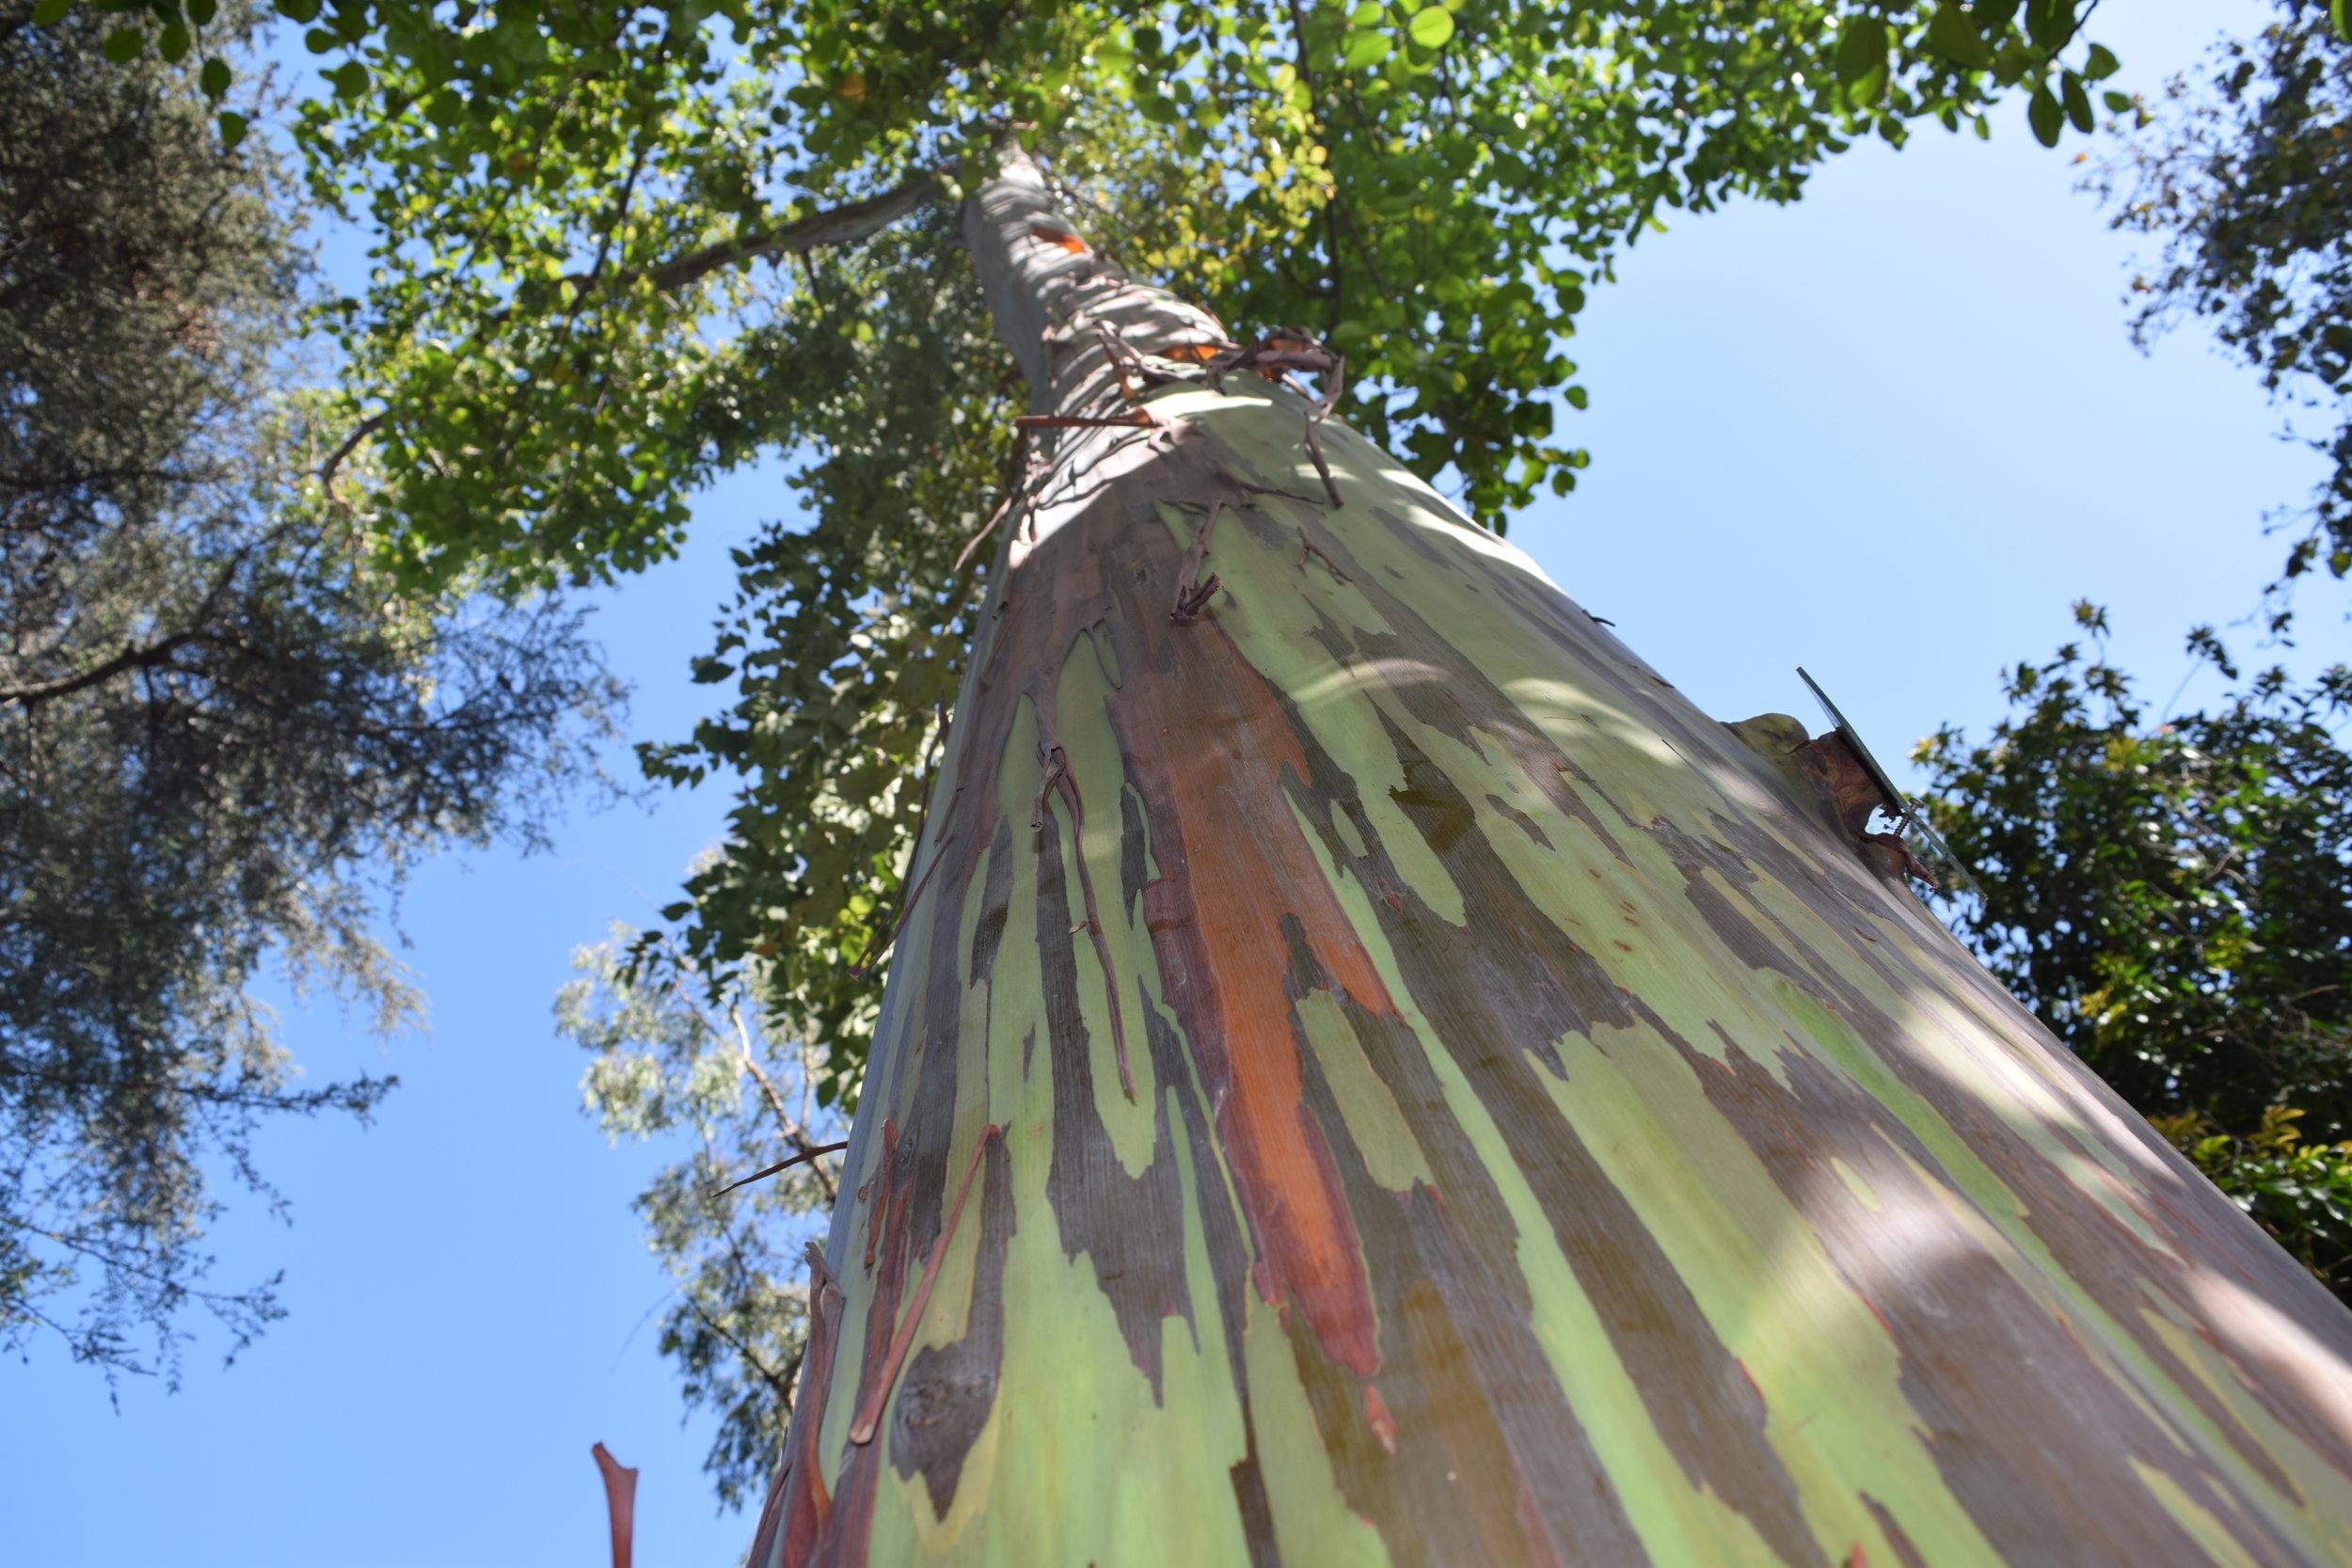 rainbow eucalyptus painted bark tree california native white Matilja Poppy at Mildred E. Mathias Botanical Garden on UCLA campus